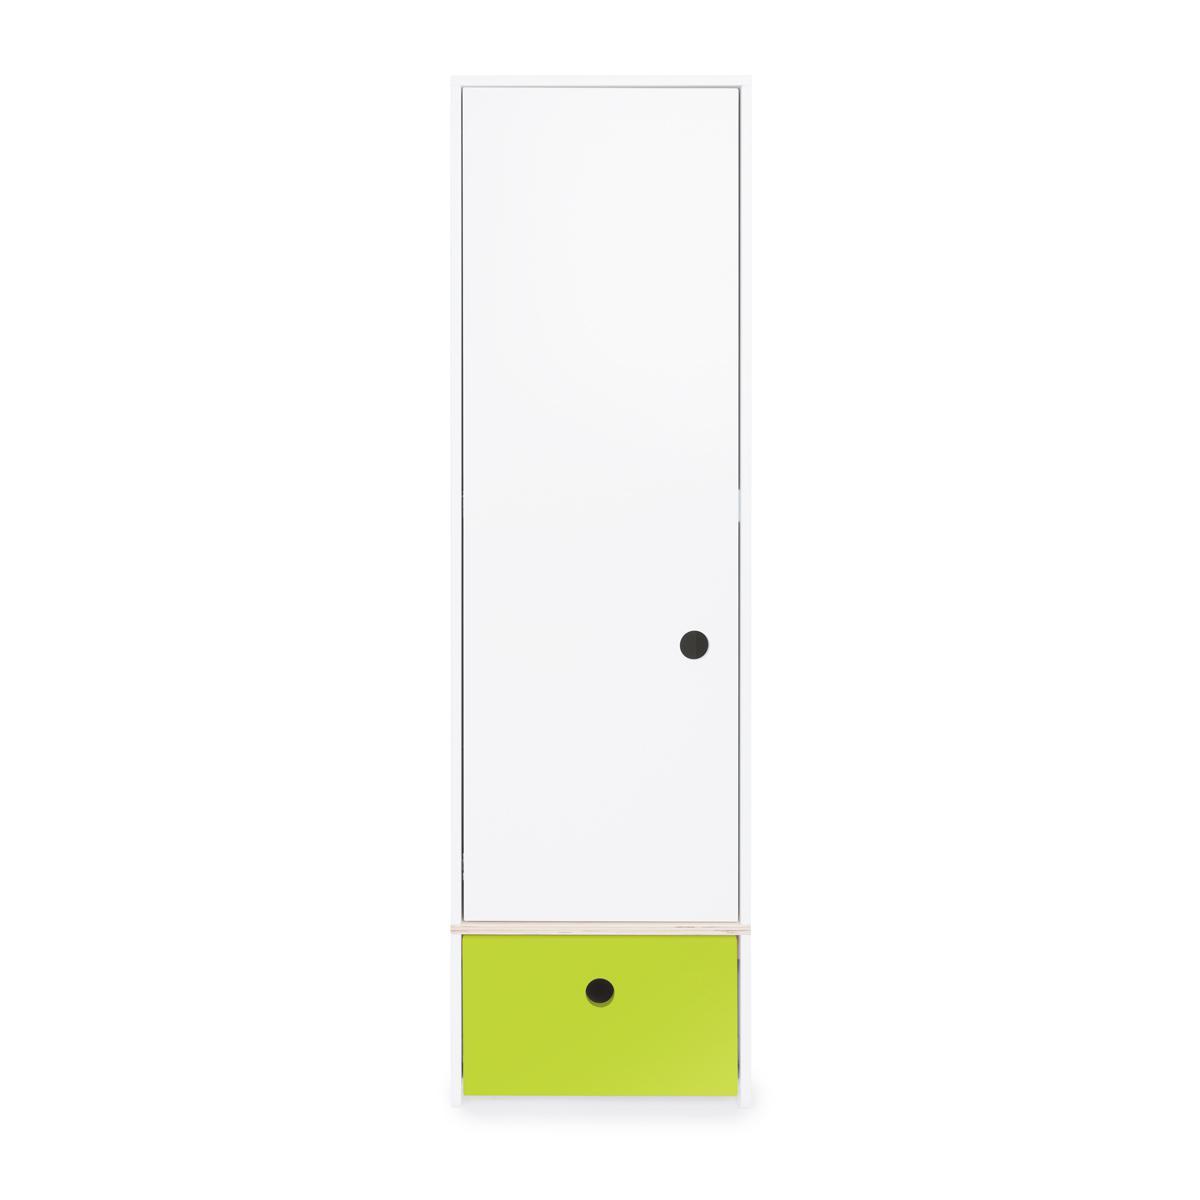 Armoire 1 porte COLORFLEX Abitare Kids façade tiroir lime